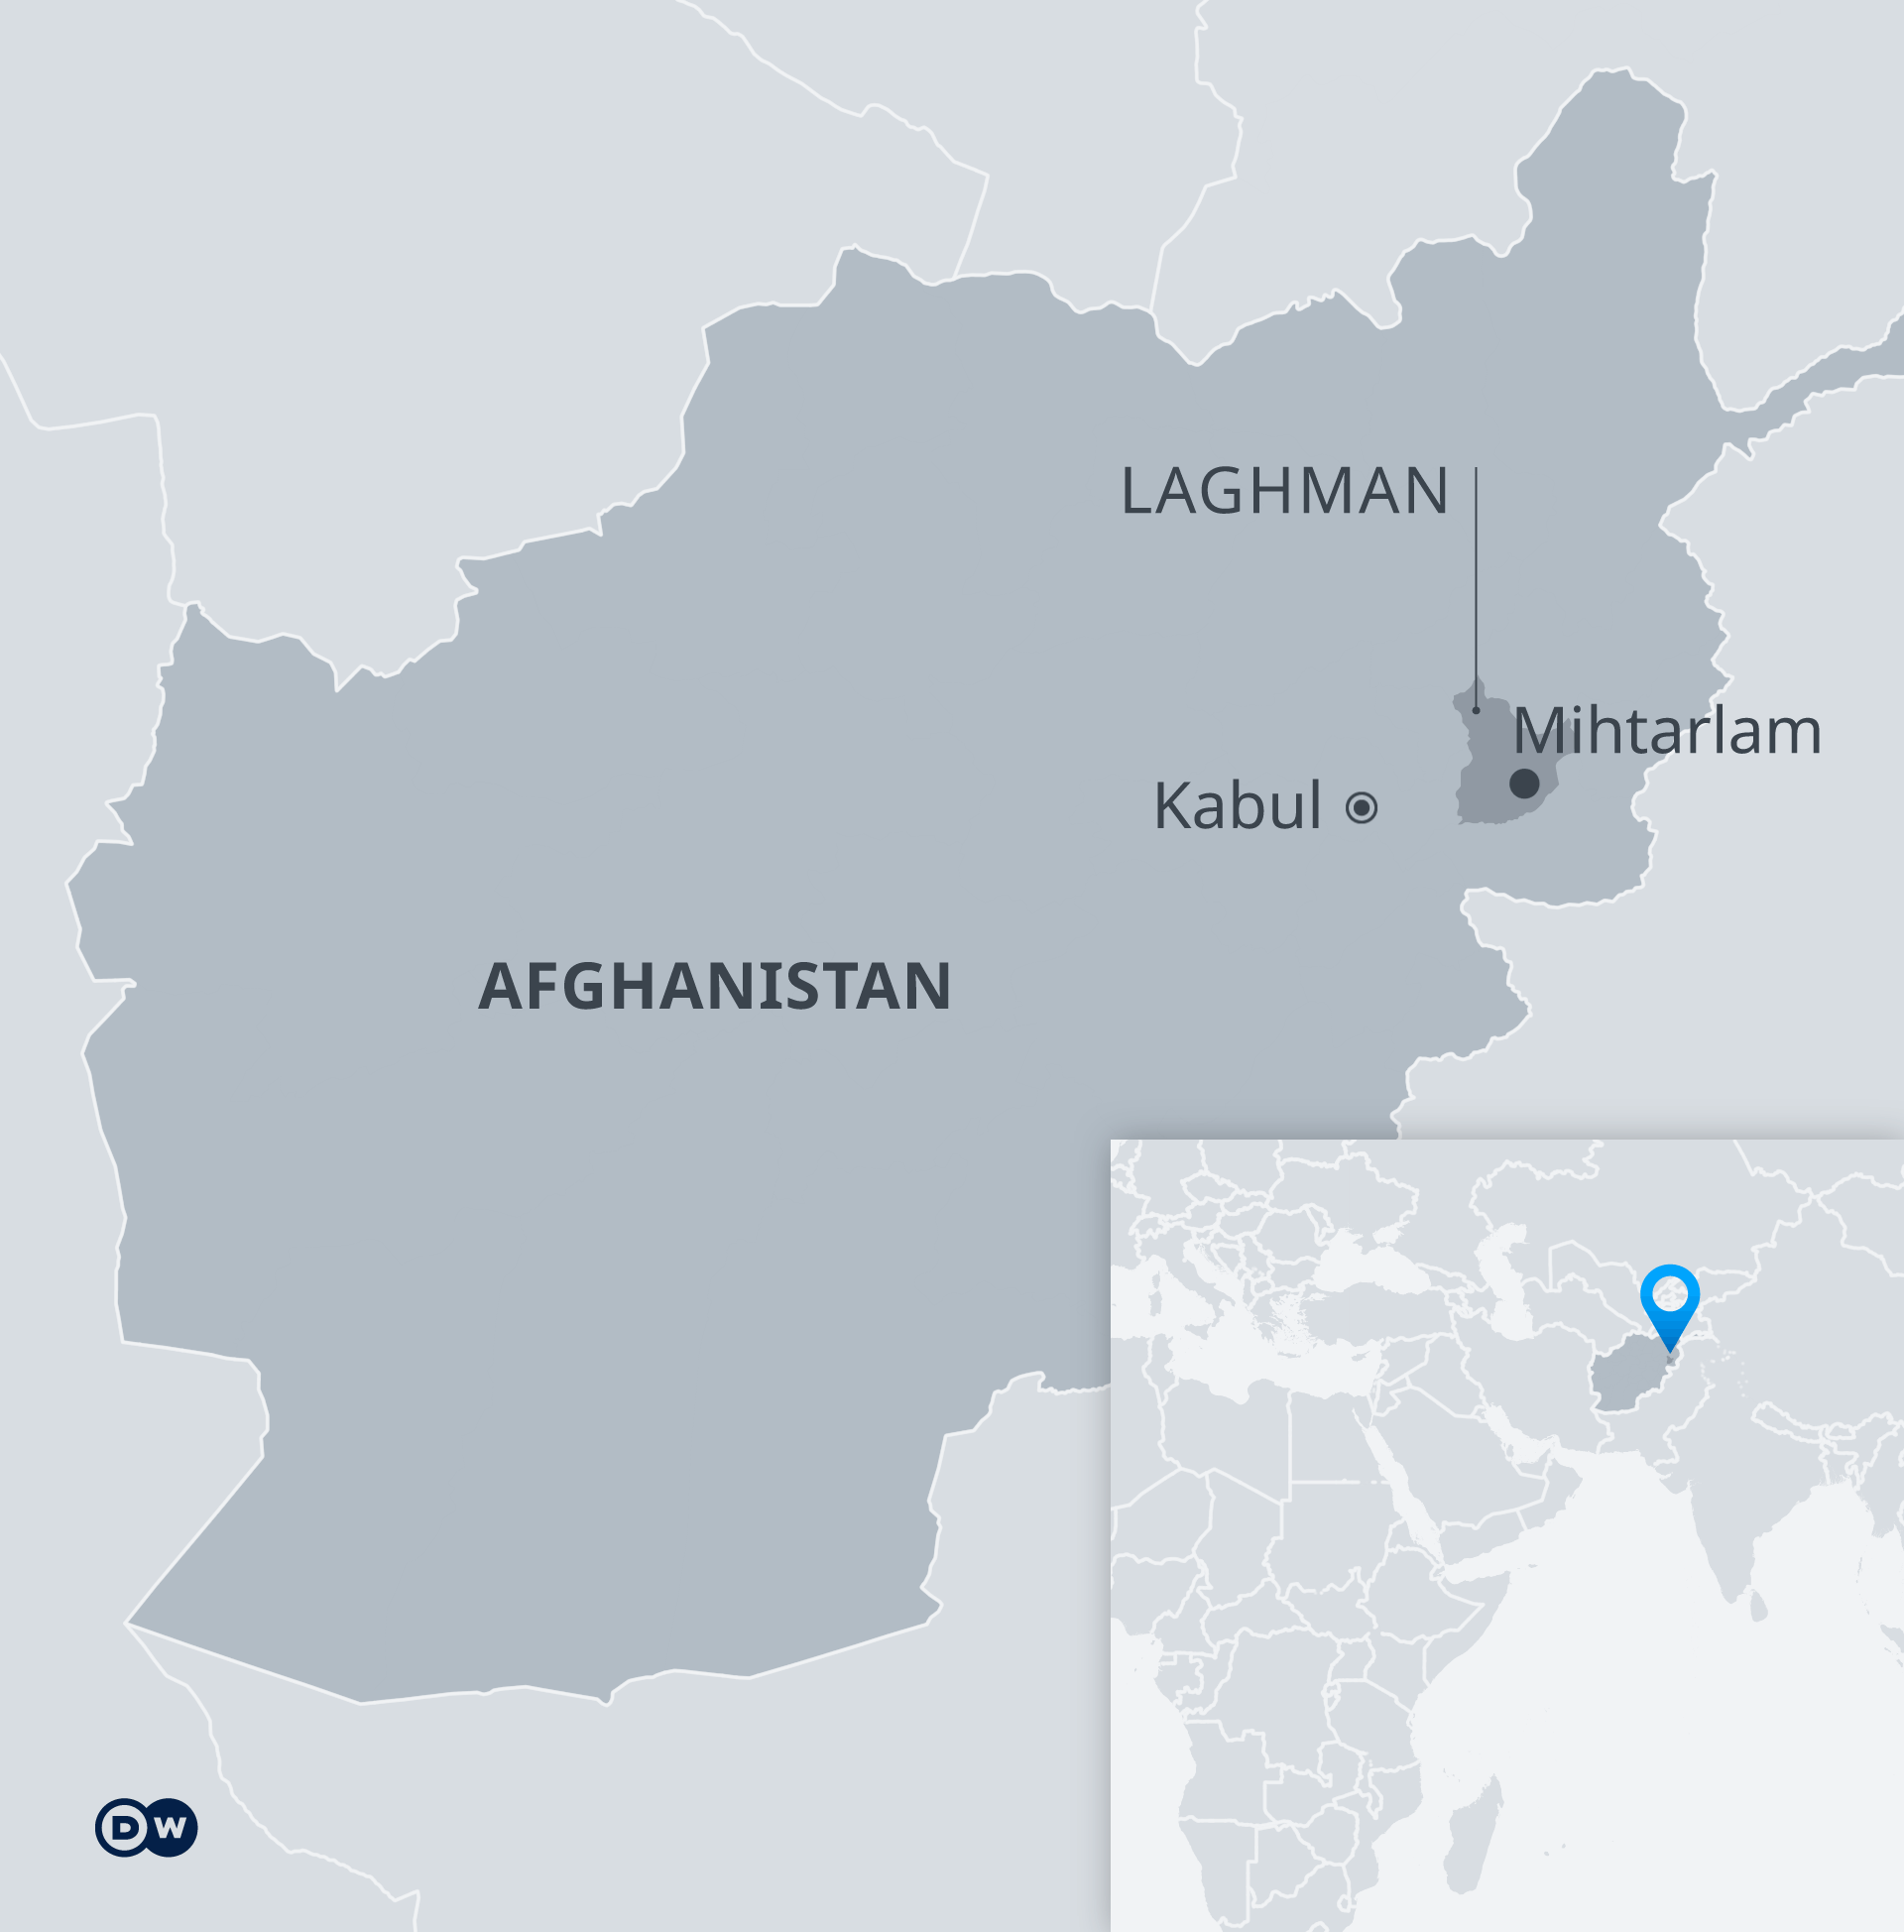 Tote Bei Selbstmordanschlag In Afghanistan Aktuell Asien Dw 05 10 2020